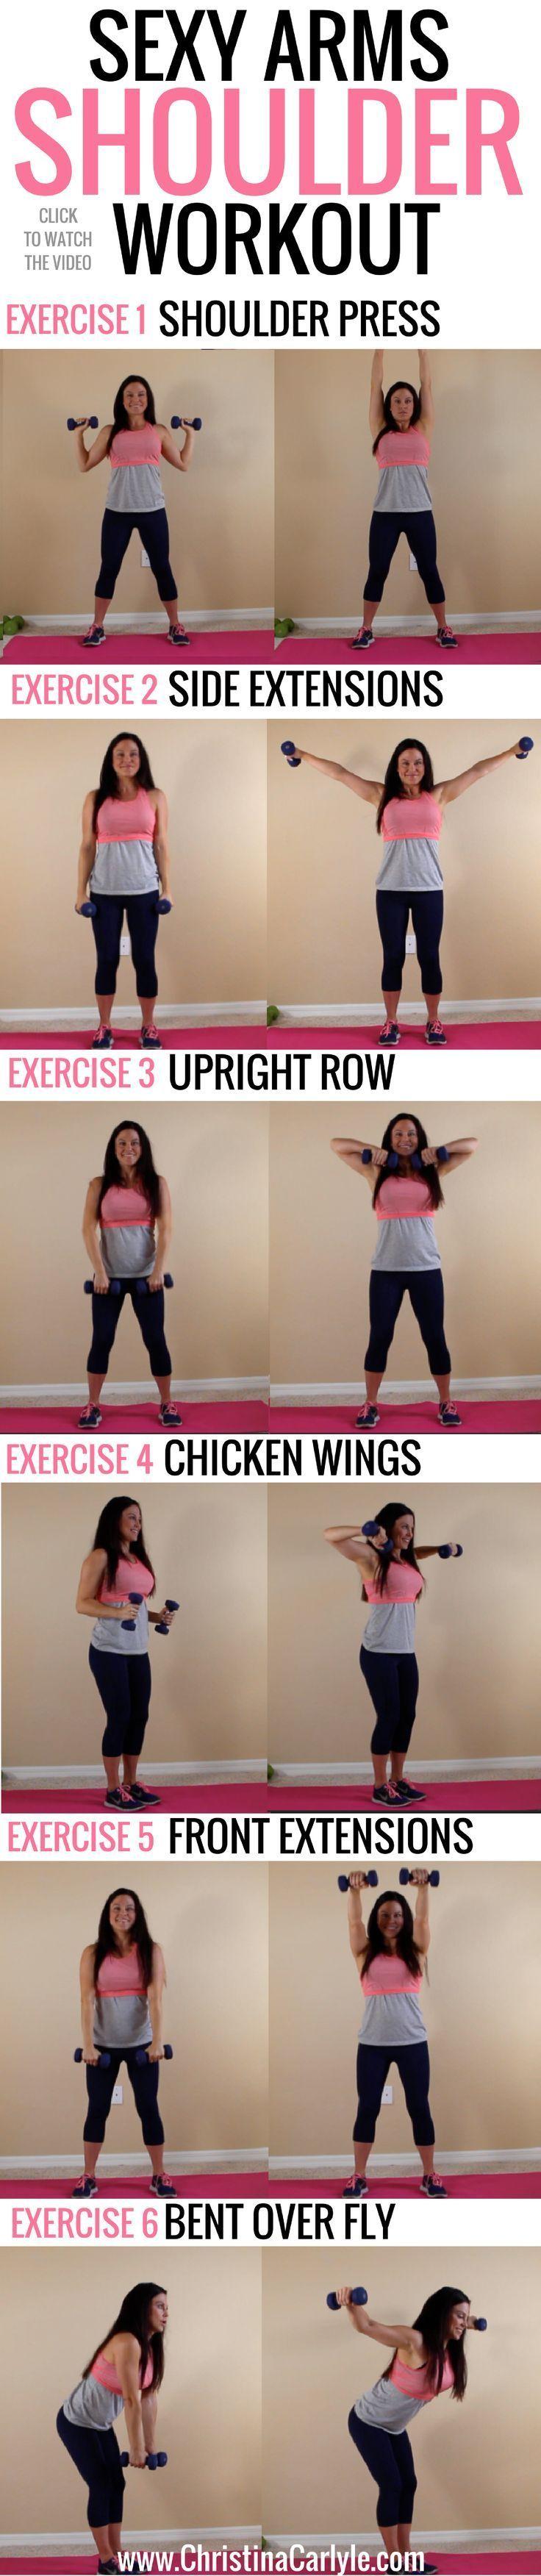 Workout Motivation: I have goals Damnit! Sexy Arms Shoulder Workout for Women